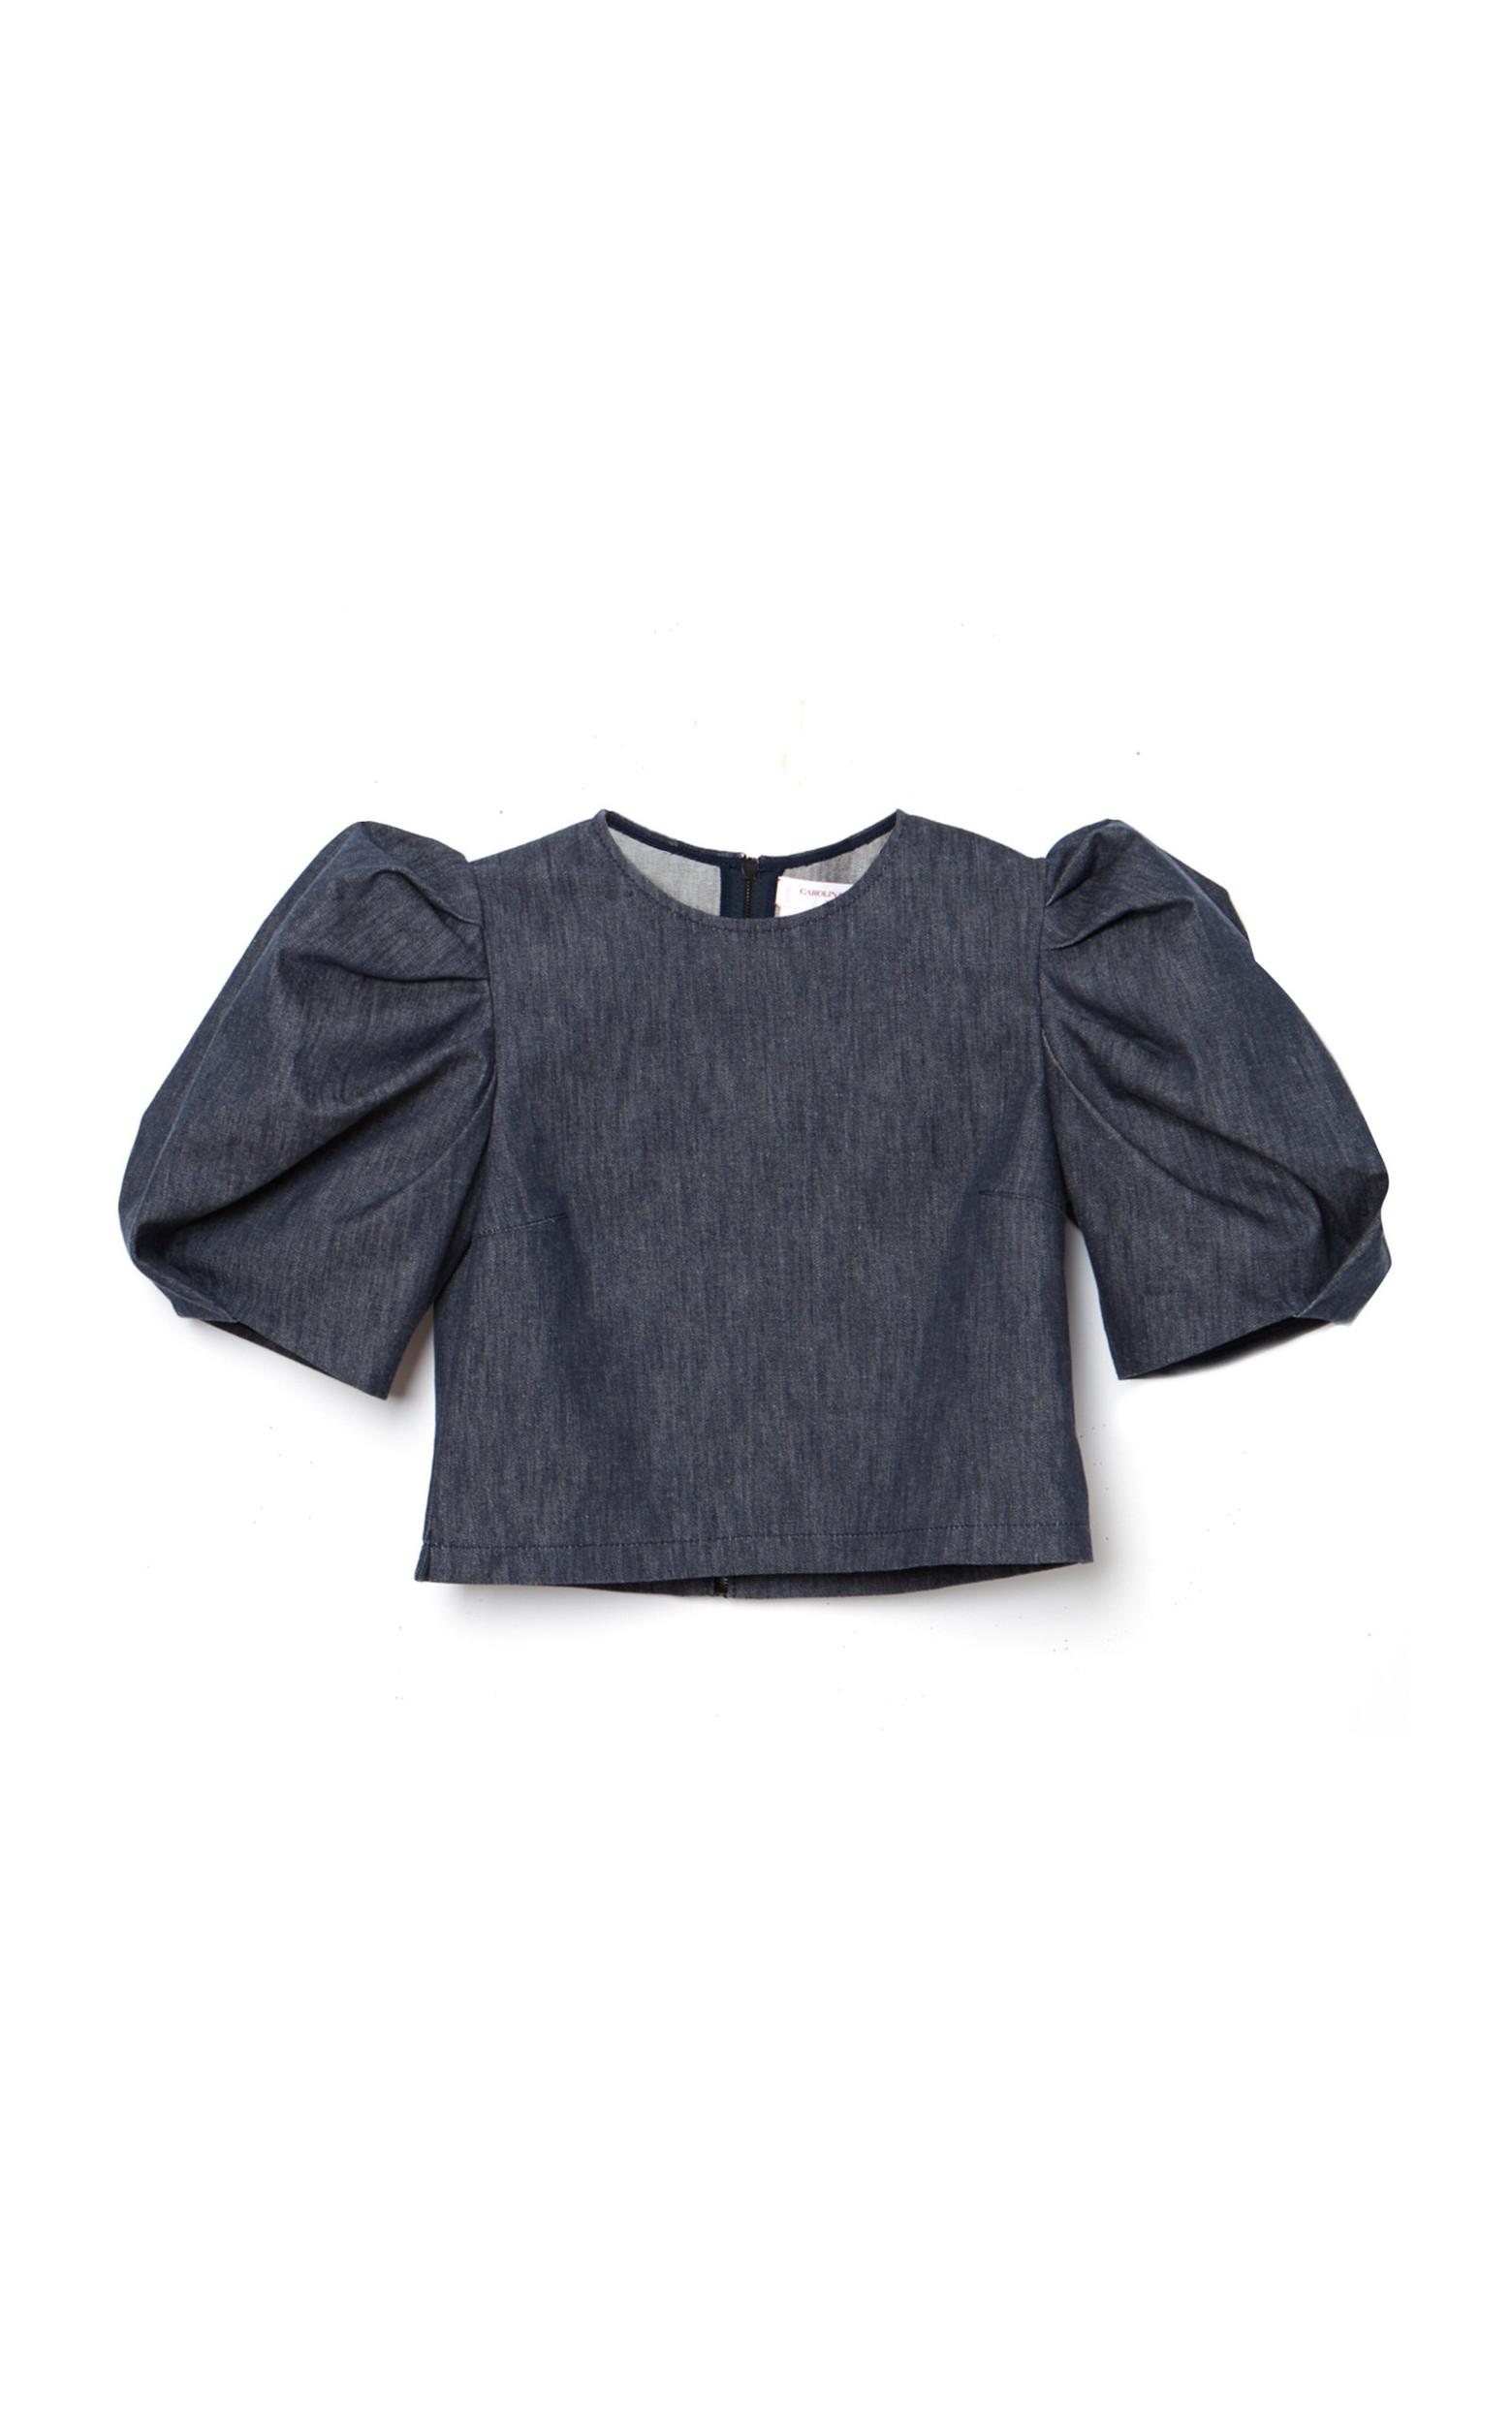 large_carolina-herrera-navy-puff-sleeve-stretch-denim-crop-top